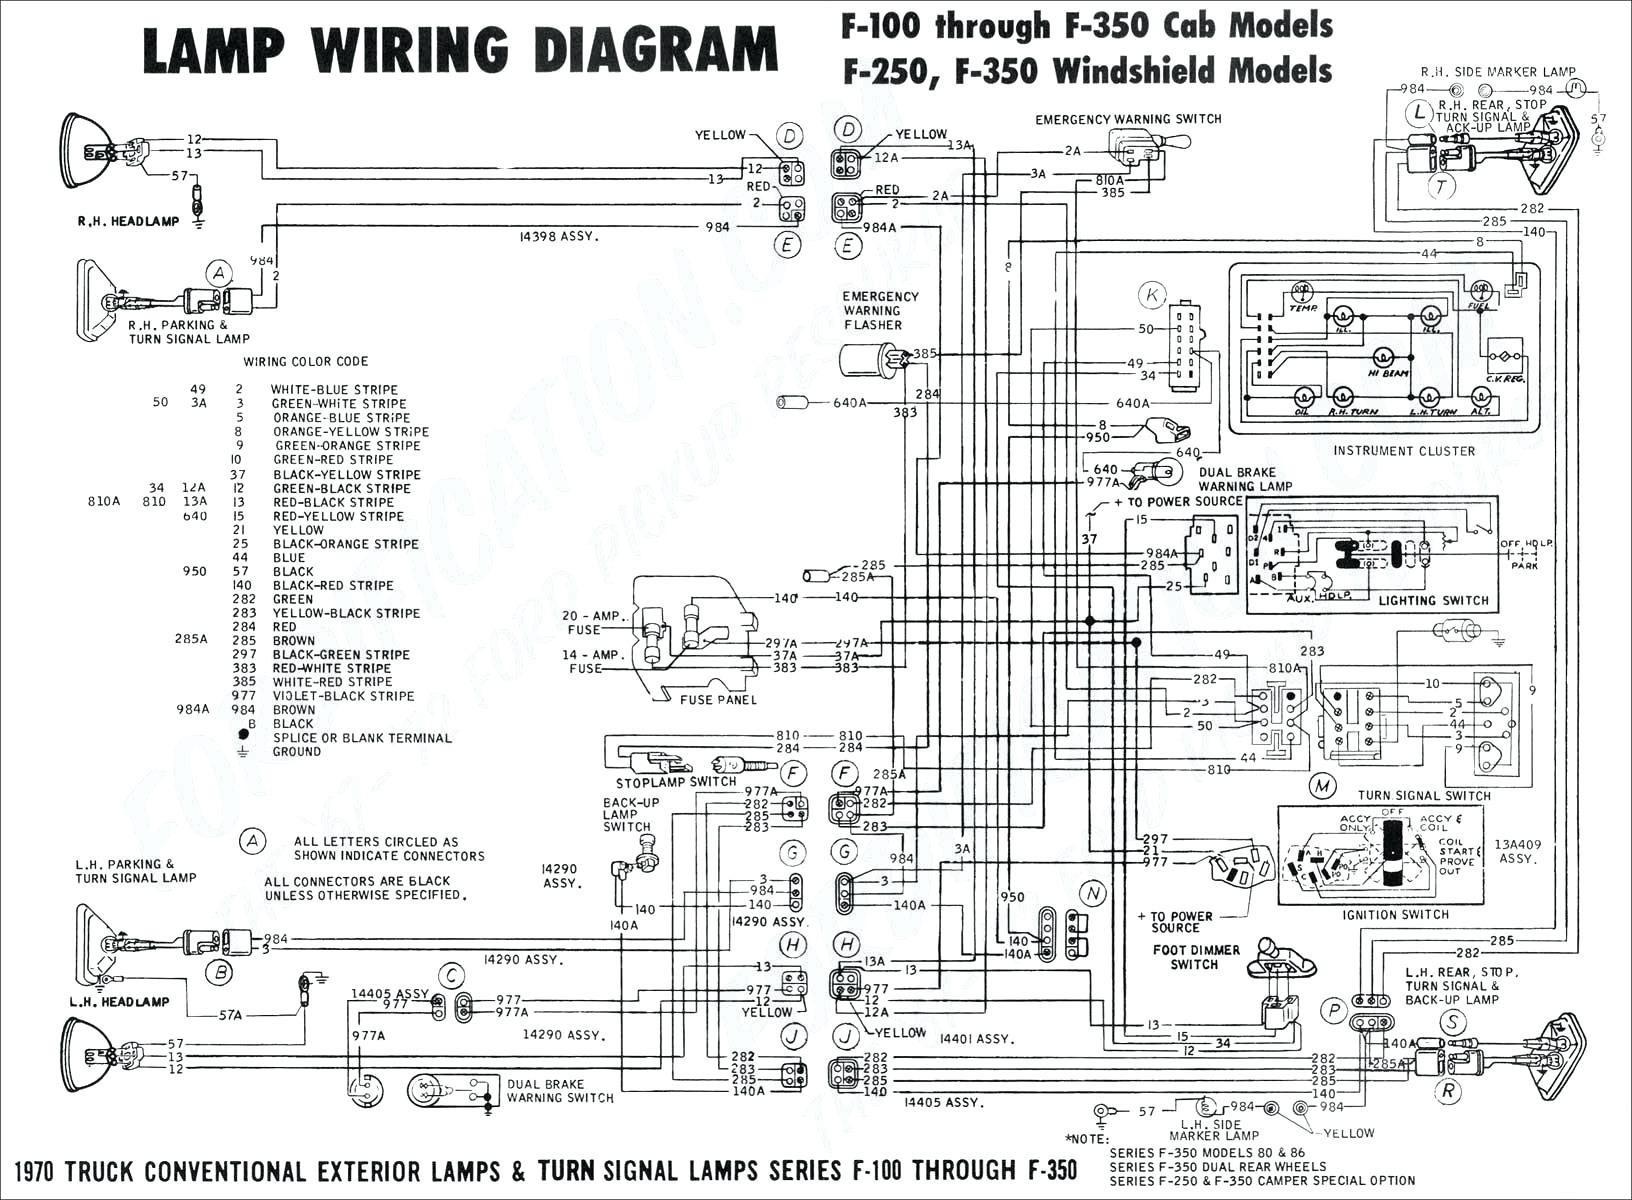 Vdo Oil Tem Wiring Diagram 2001 ford Escape Pcm Plug Wiring Diagram Of Vdo Oil Tem Wiring Diagram